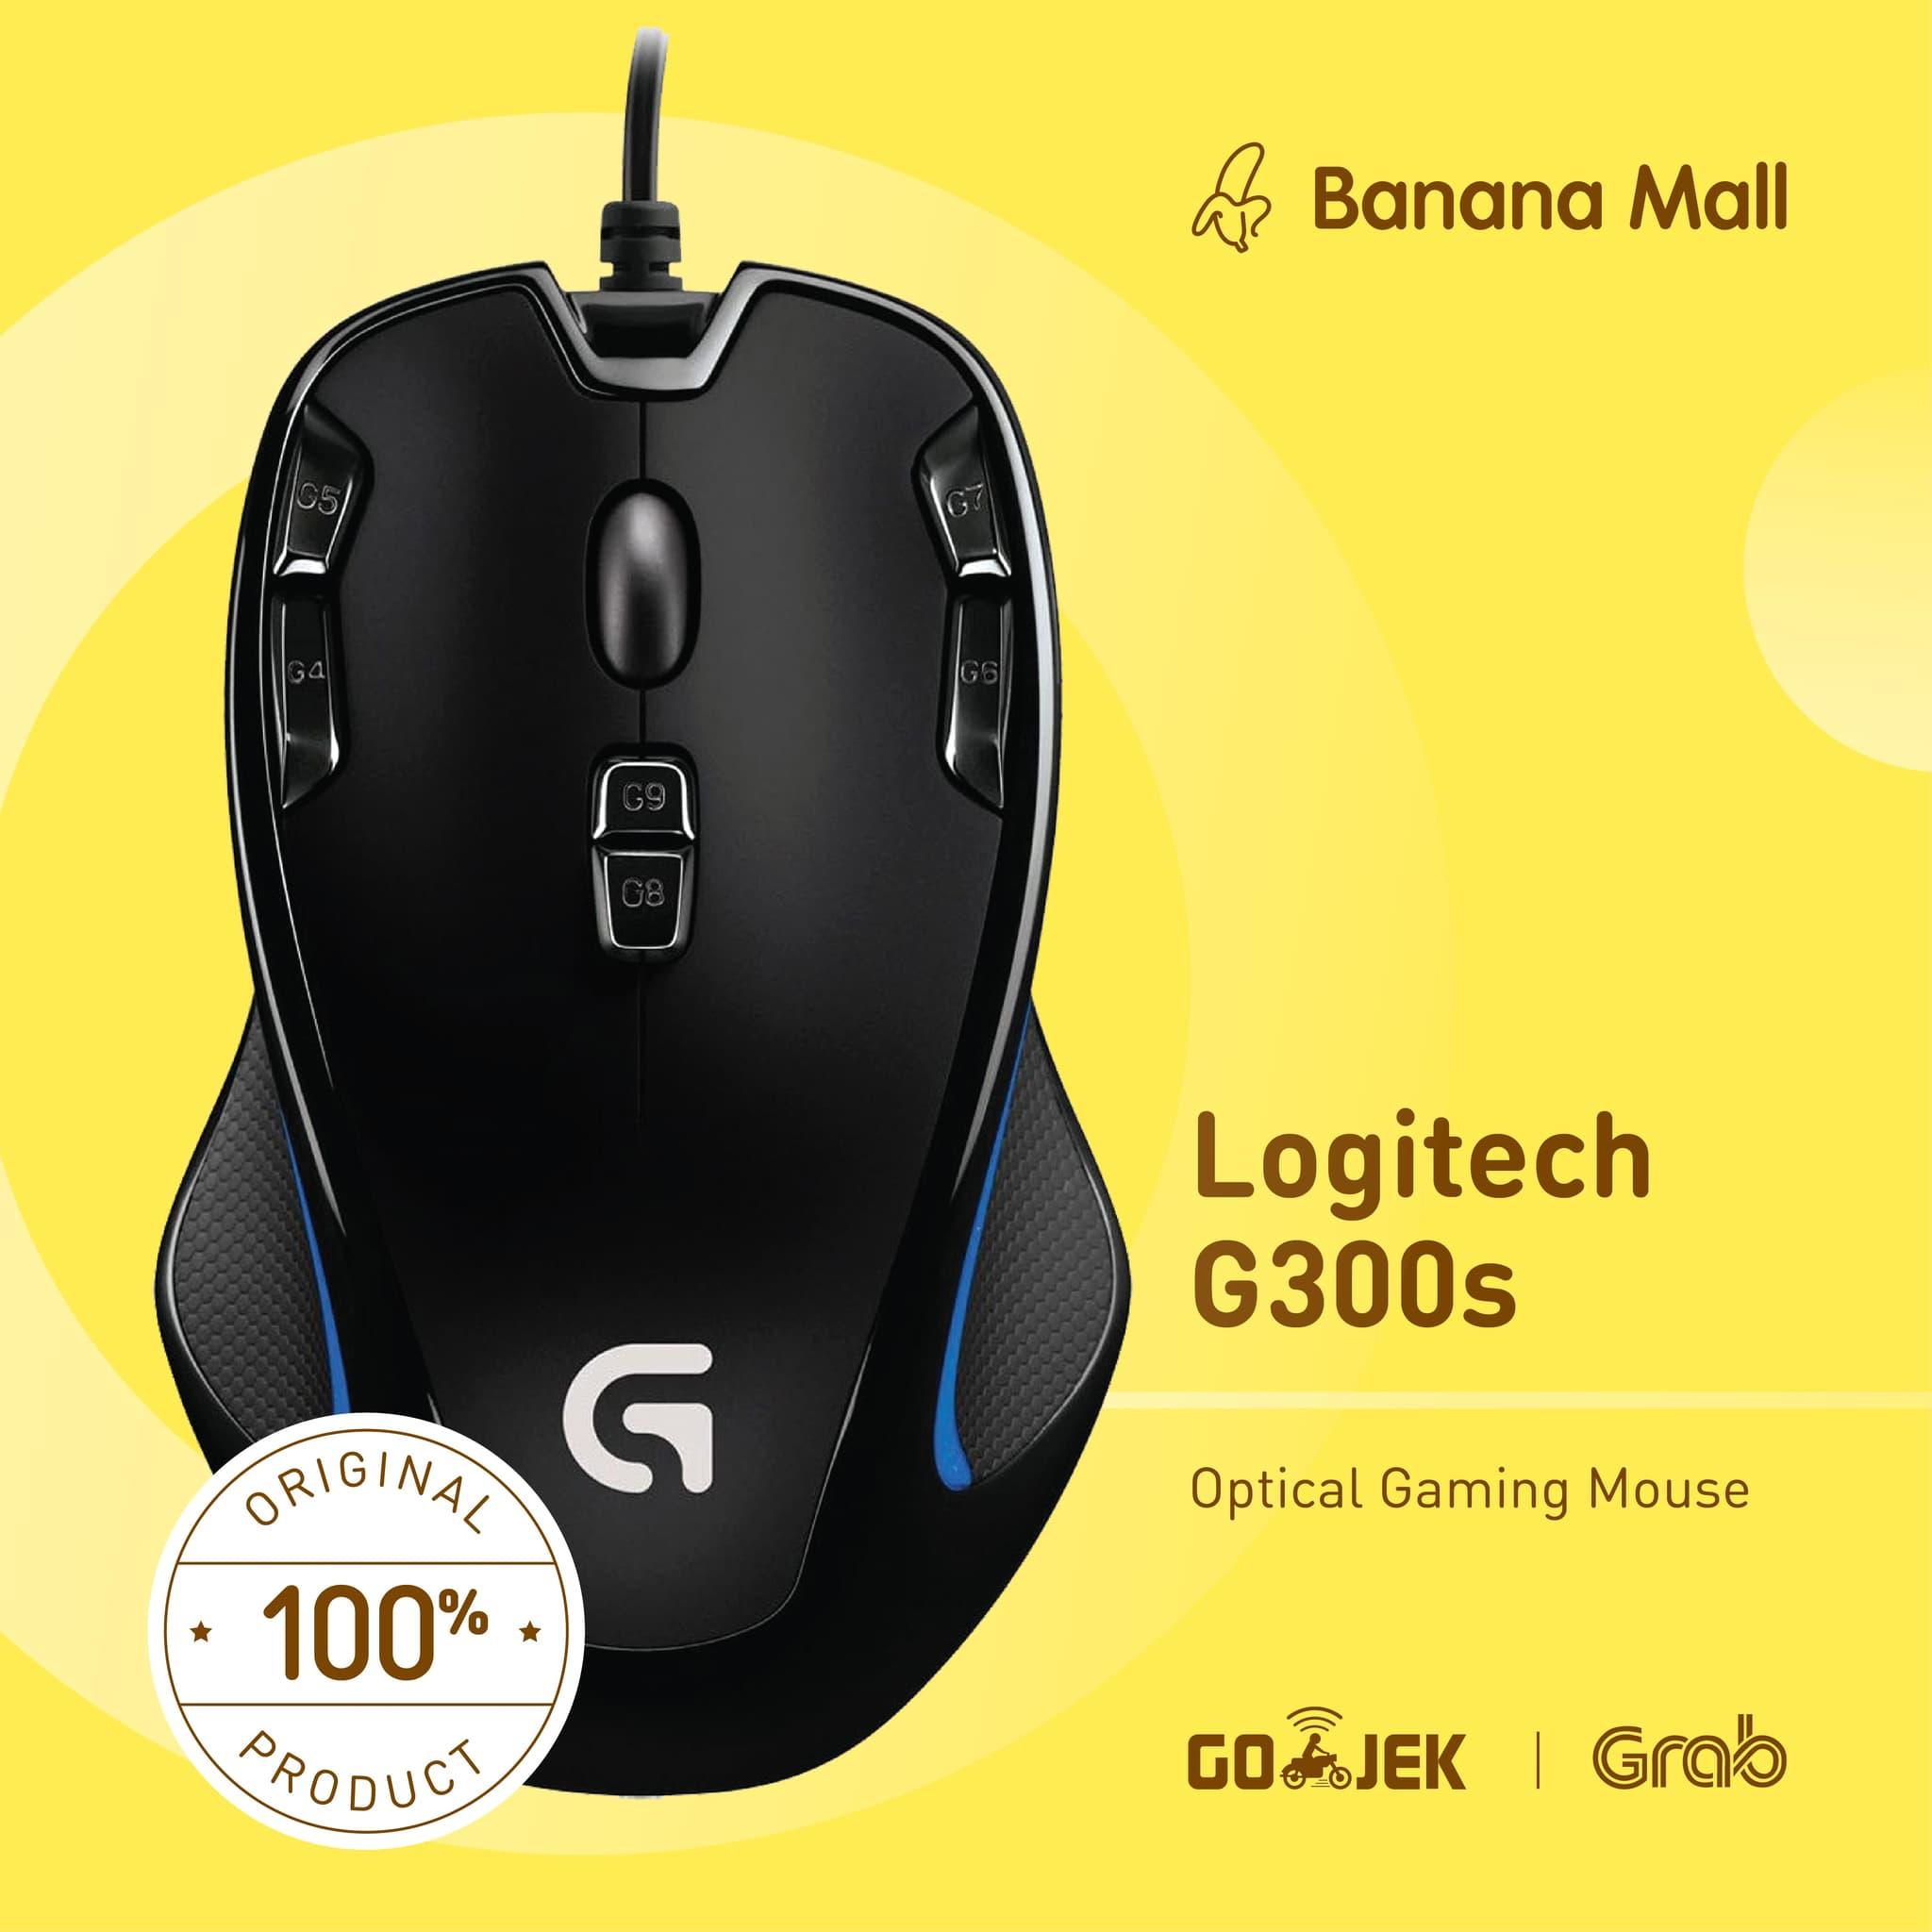 Jual Original Logitech G300S Optical Gaming Mouse Banana Mall